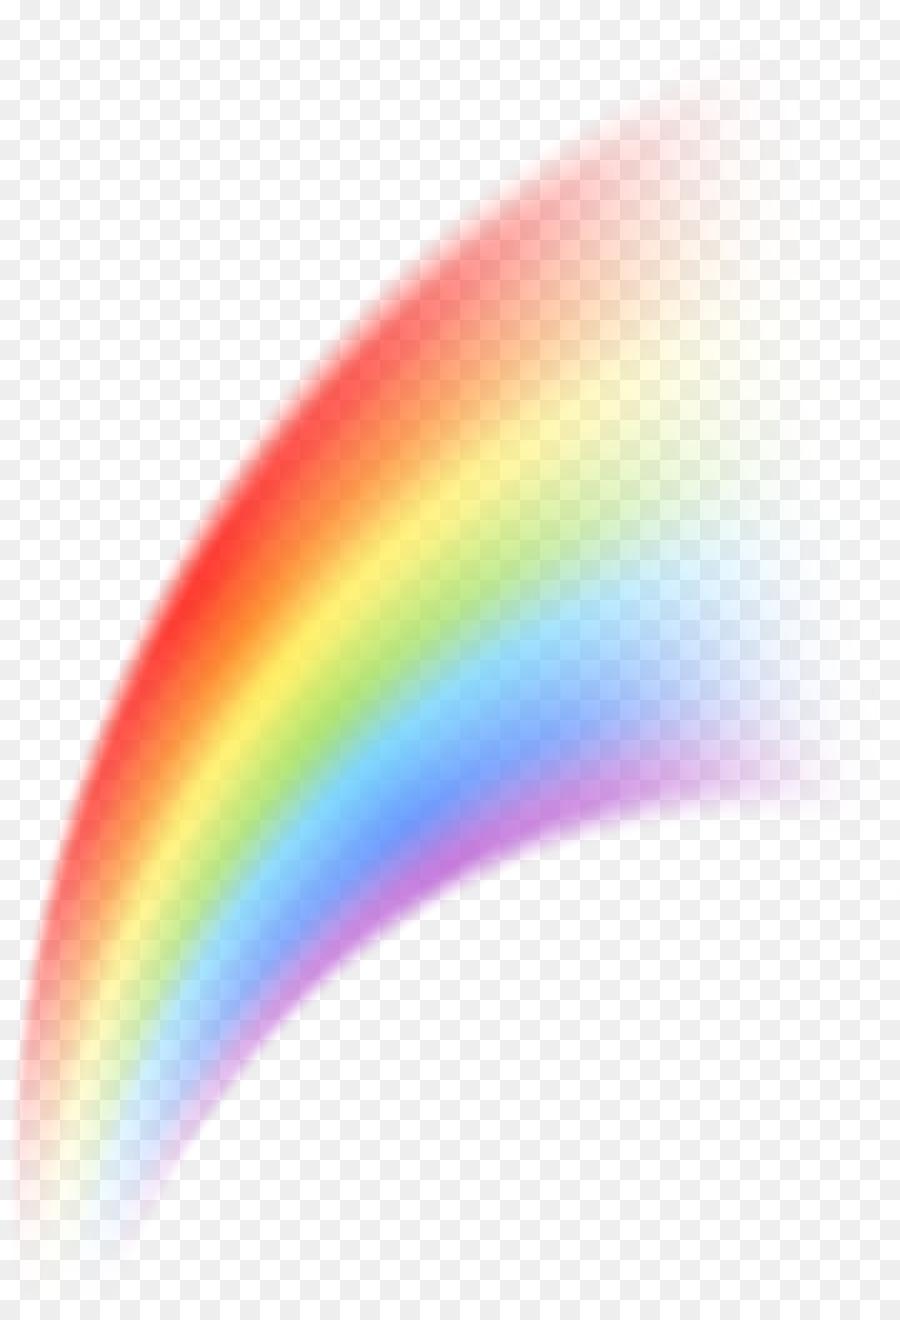 Rainbow Desktop Wallpaper Curve Clip art - rose border frame png ...